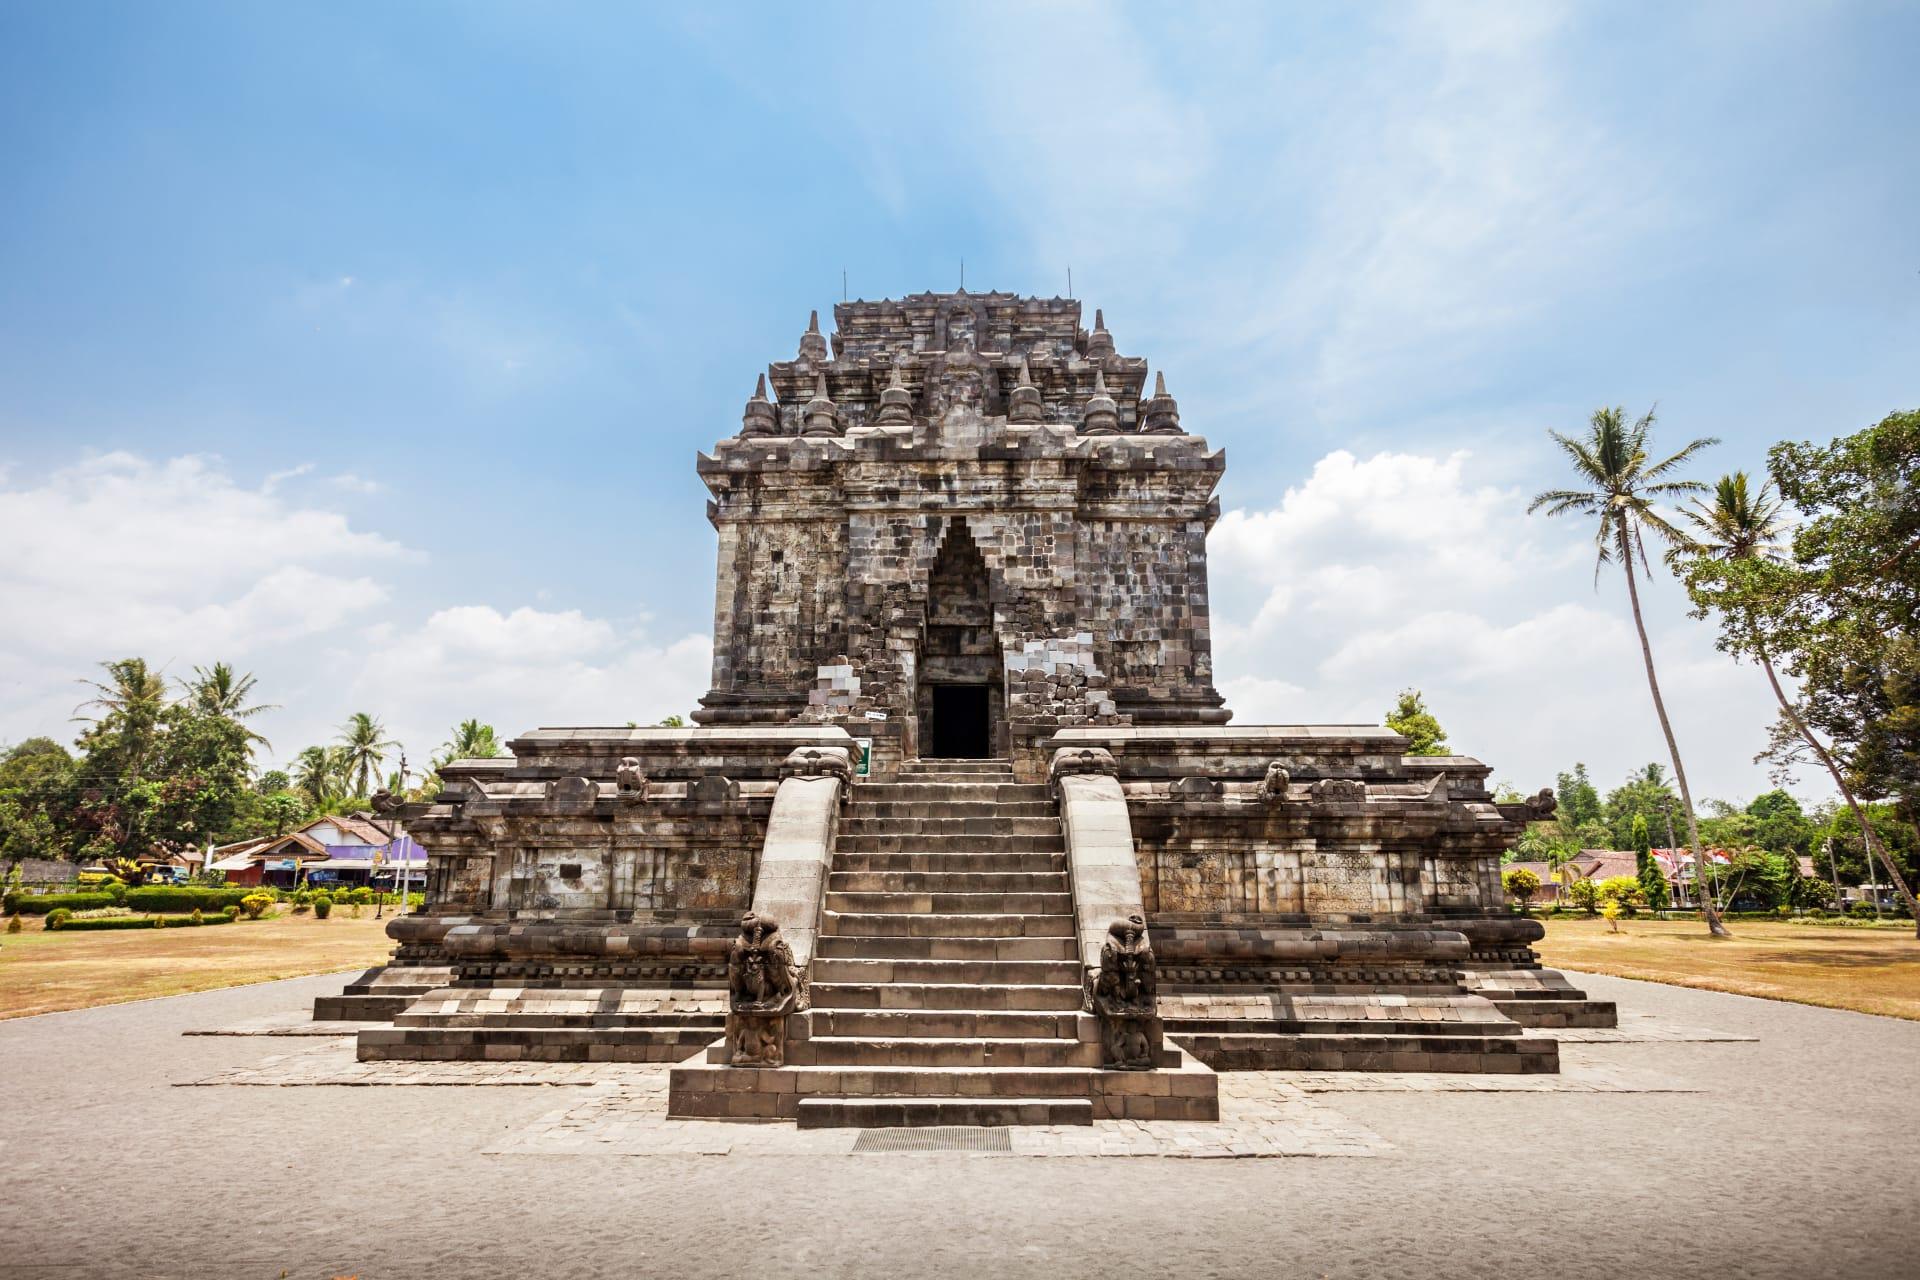 Yogyakarta - Mendut & Pawon Temples: The First Stage of Pilgrimage to Borobudur Temple